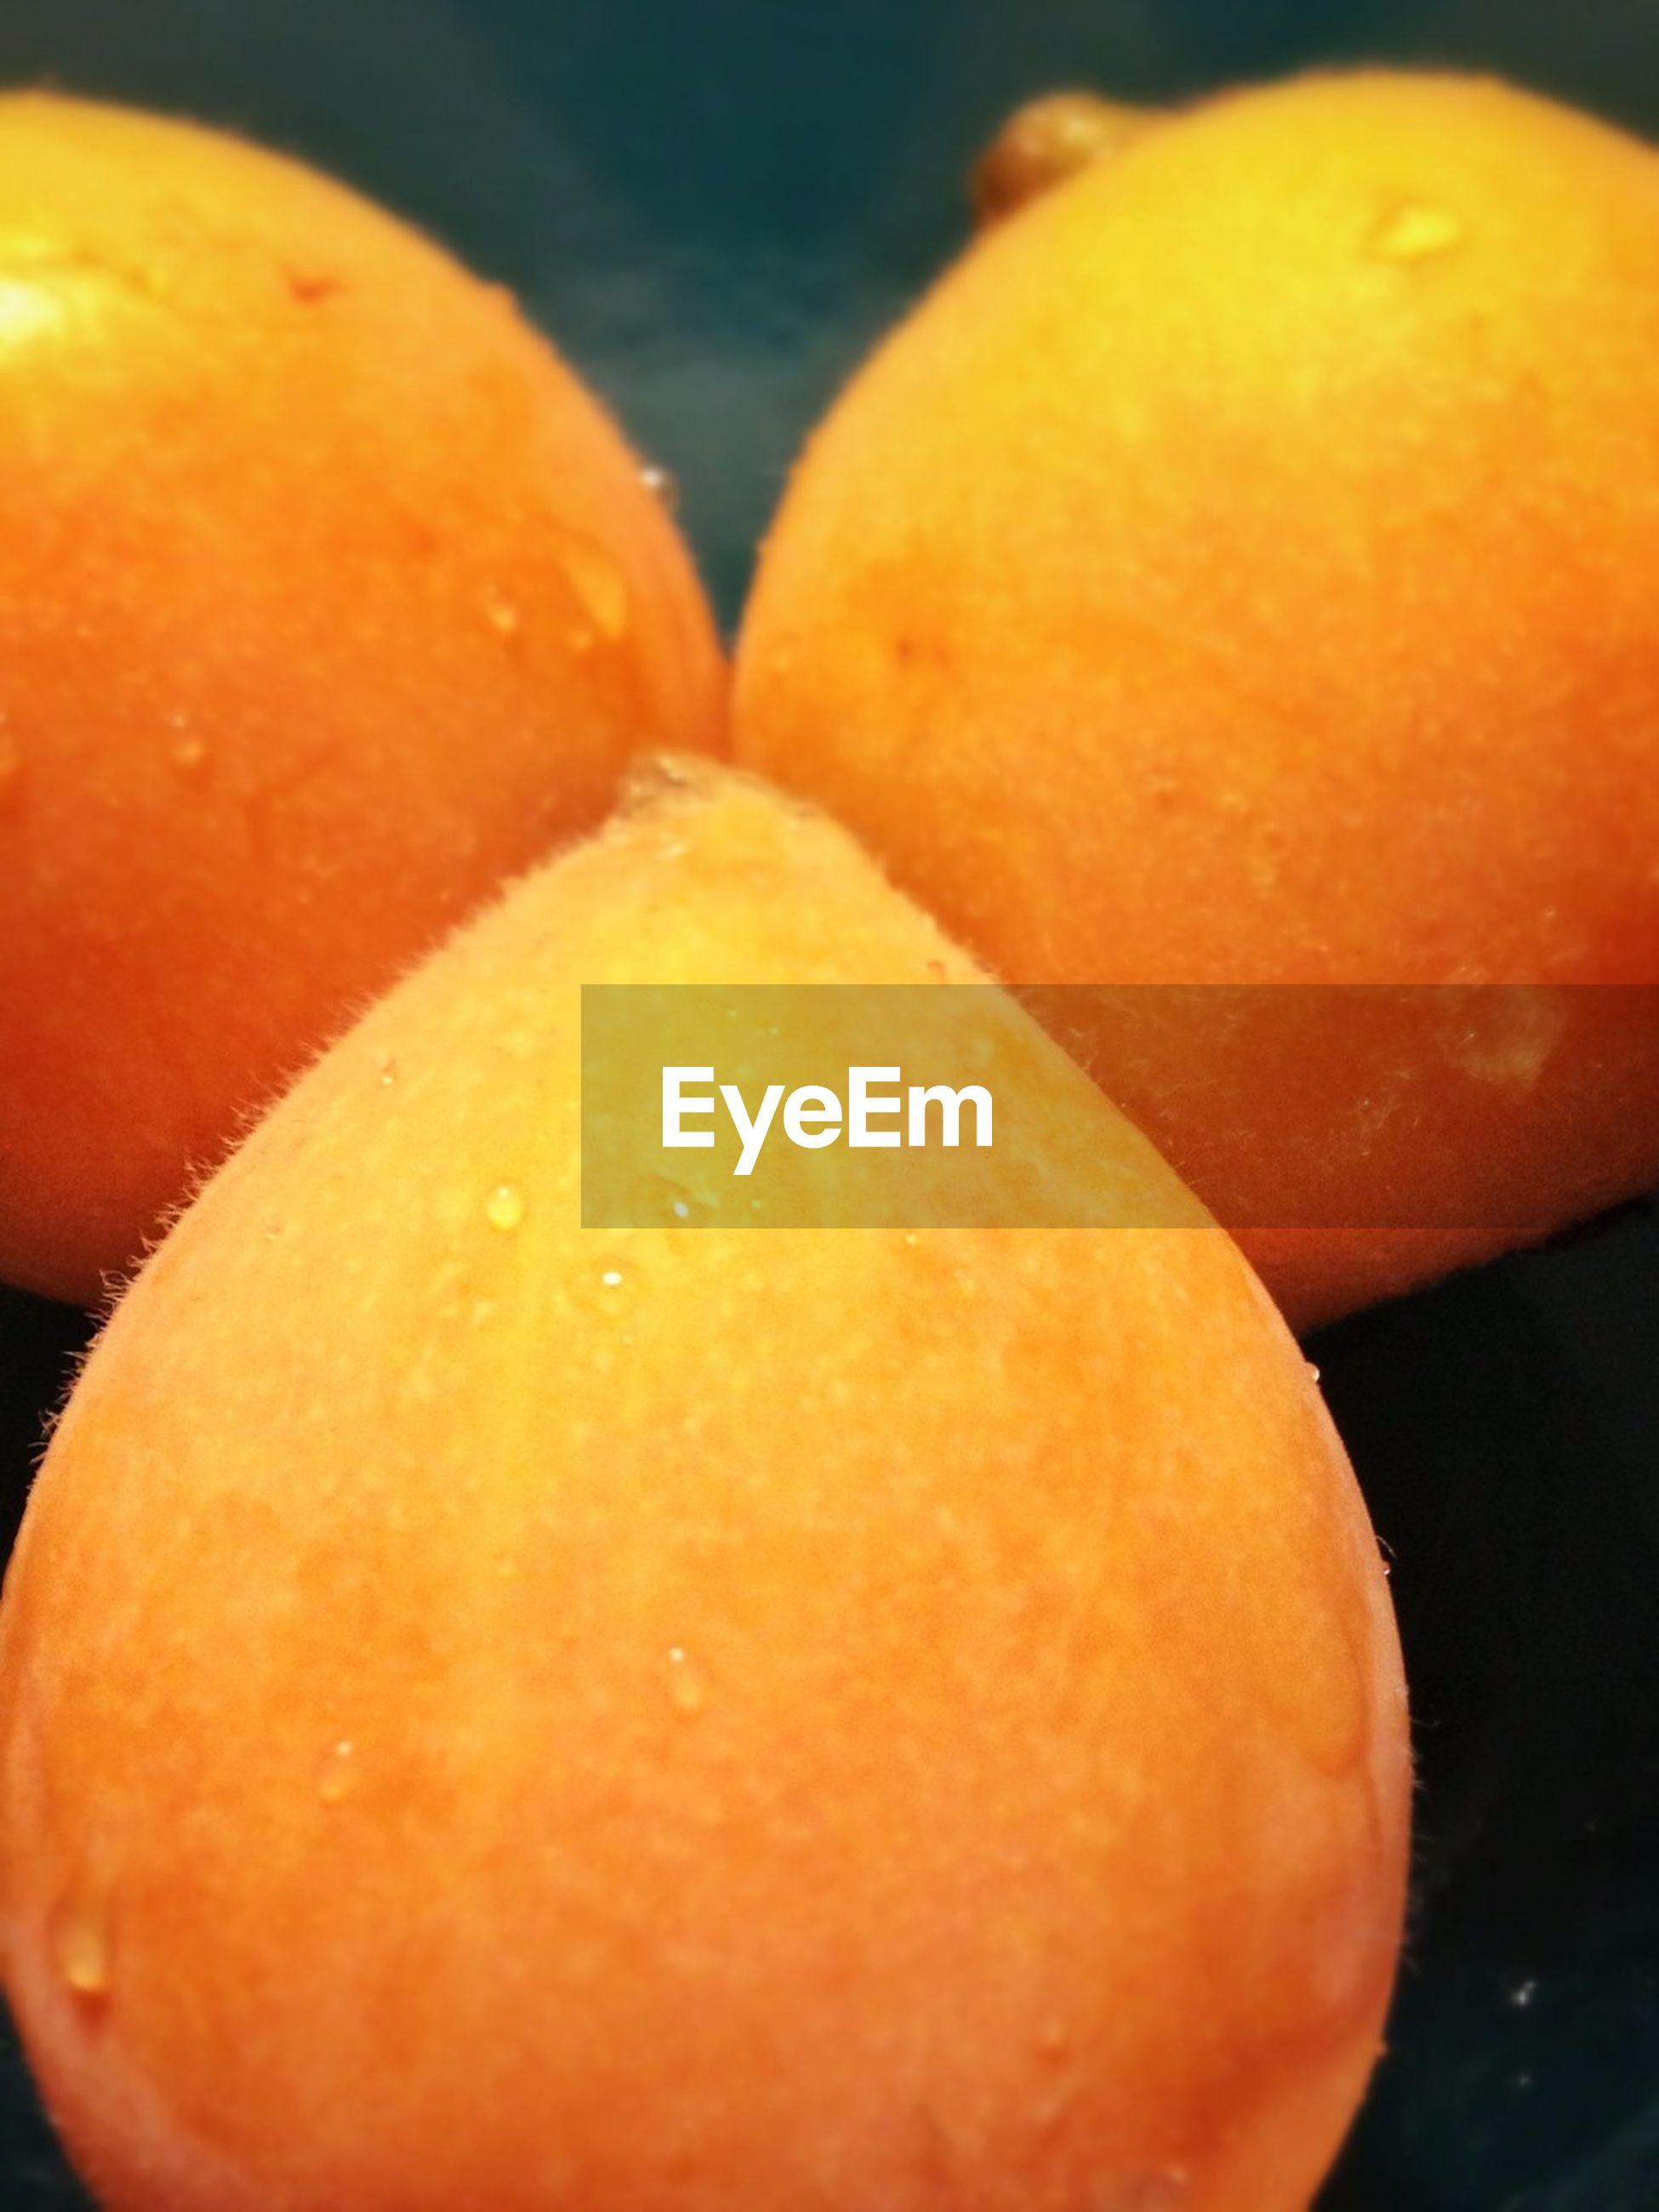 food and drink, freshness, food, healthy eating, fruit, close-up, indoors, orange - fruit, still life, citrus fruit, orange color, slice, organic, ripe, juicy, lemon, healthy lifestyle, yellow, apple - fruit, focus on foreground